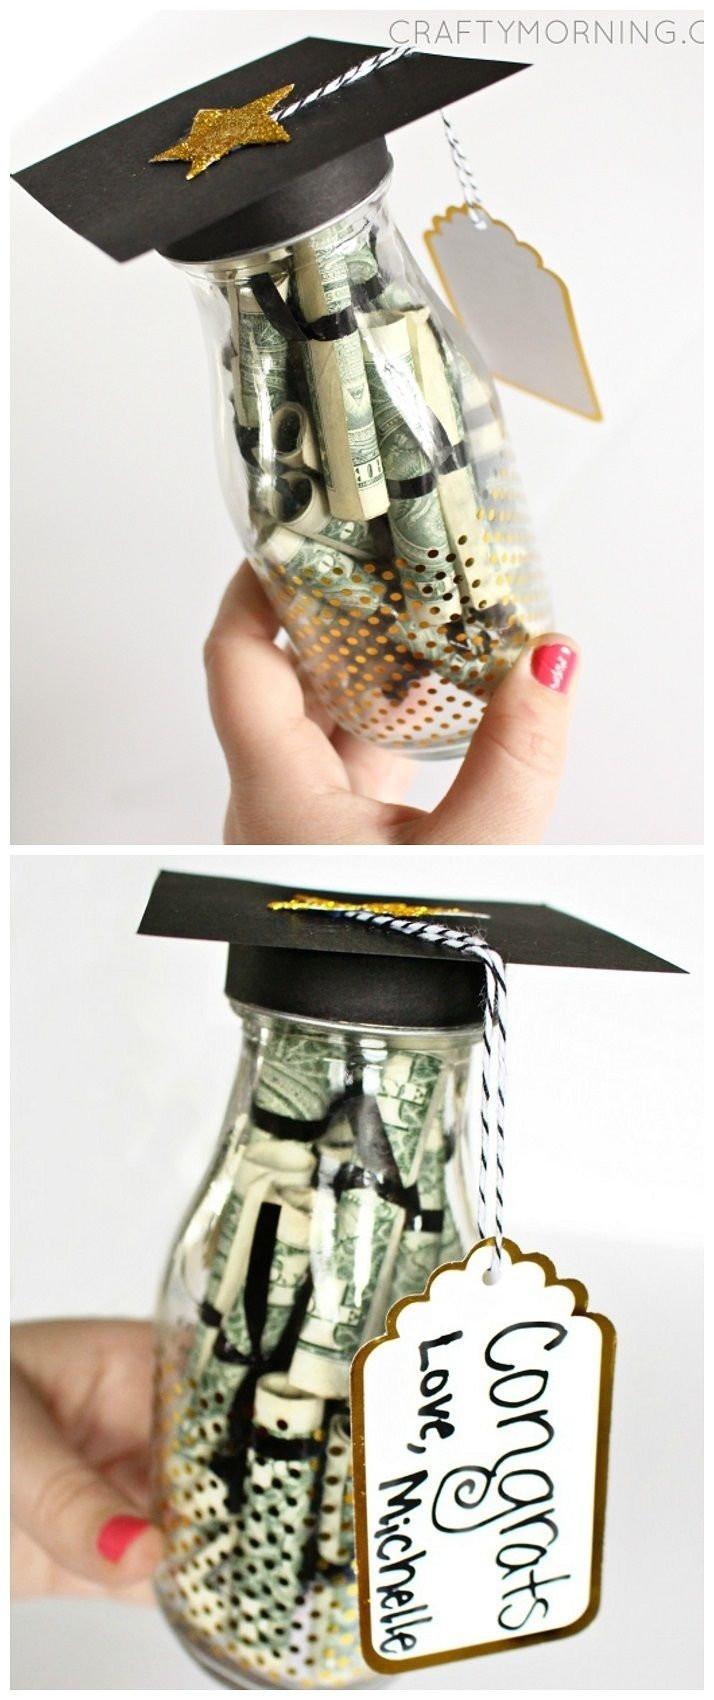 Graduation Gift Ideas For Girls  10 Unique Nursing School Graduation Gift Ideas 2019